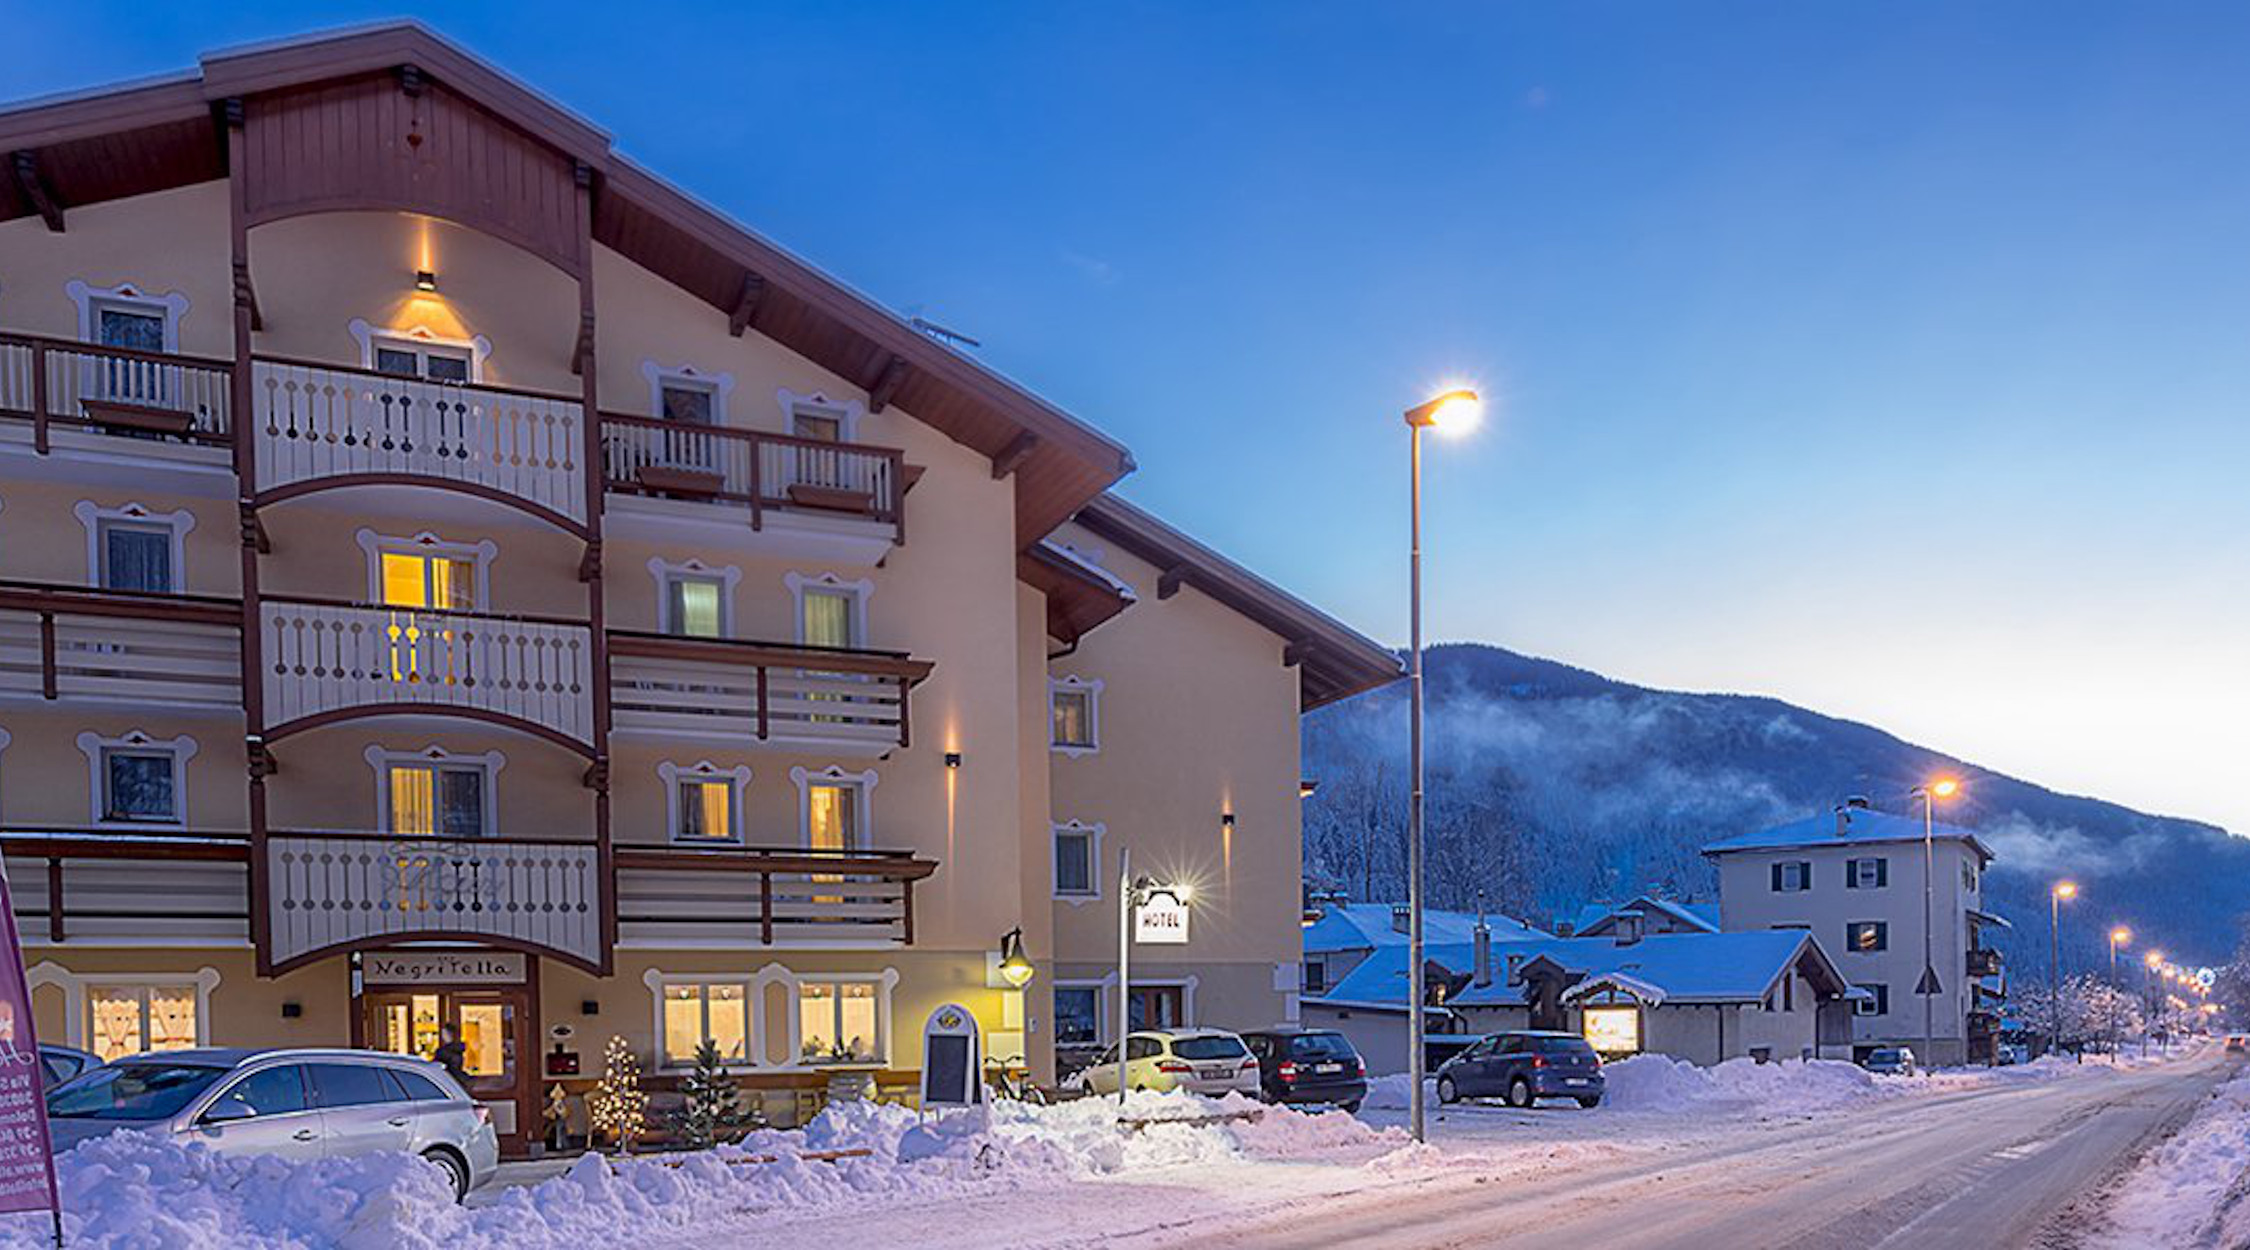 hotelnegritella_esternoinvernale